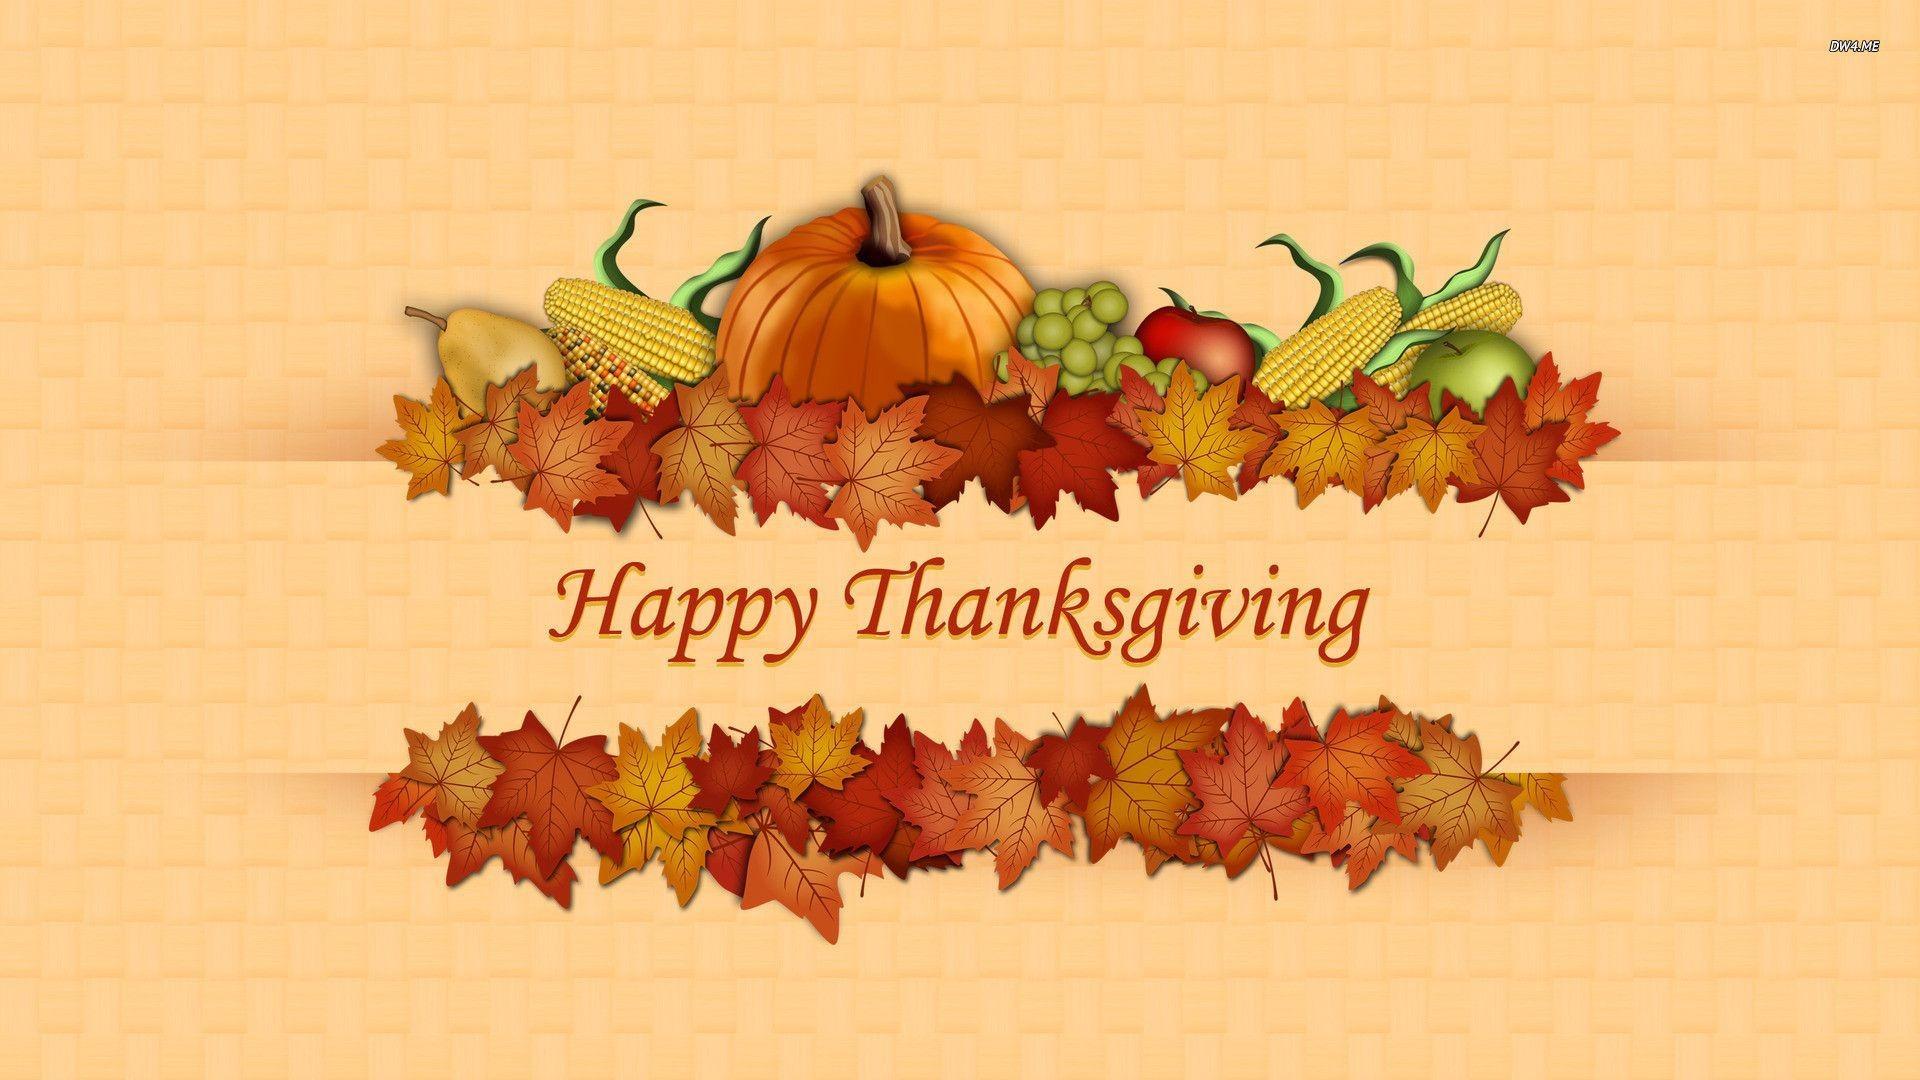 Res: 1920x1080, 5. free-thanksgiving-wallpaper-for-desktop5-600x338